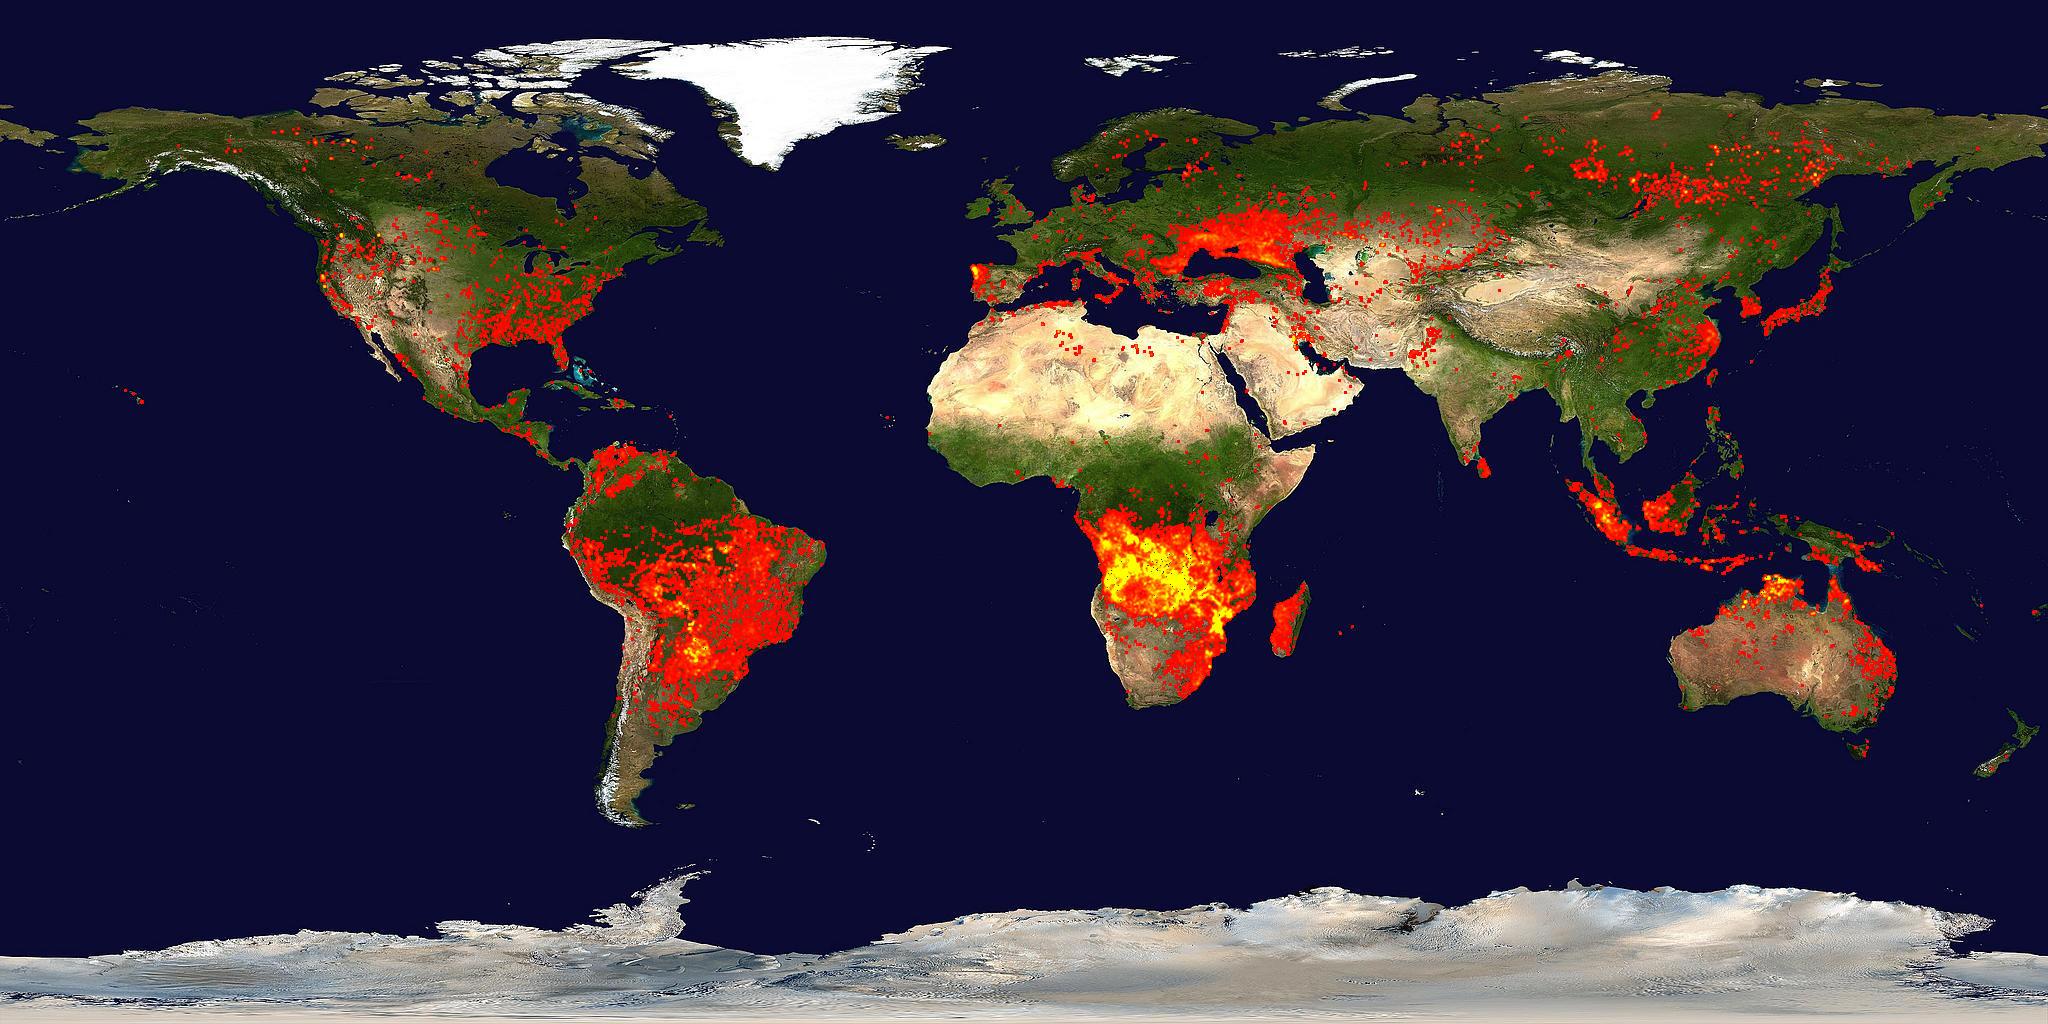 mapa fogos Debate sobre os incêndios + | Quinta do Sargaçal mapa fogos